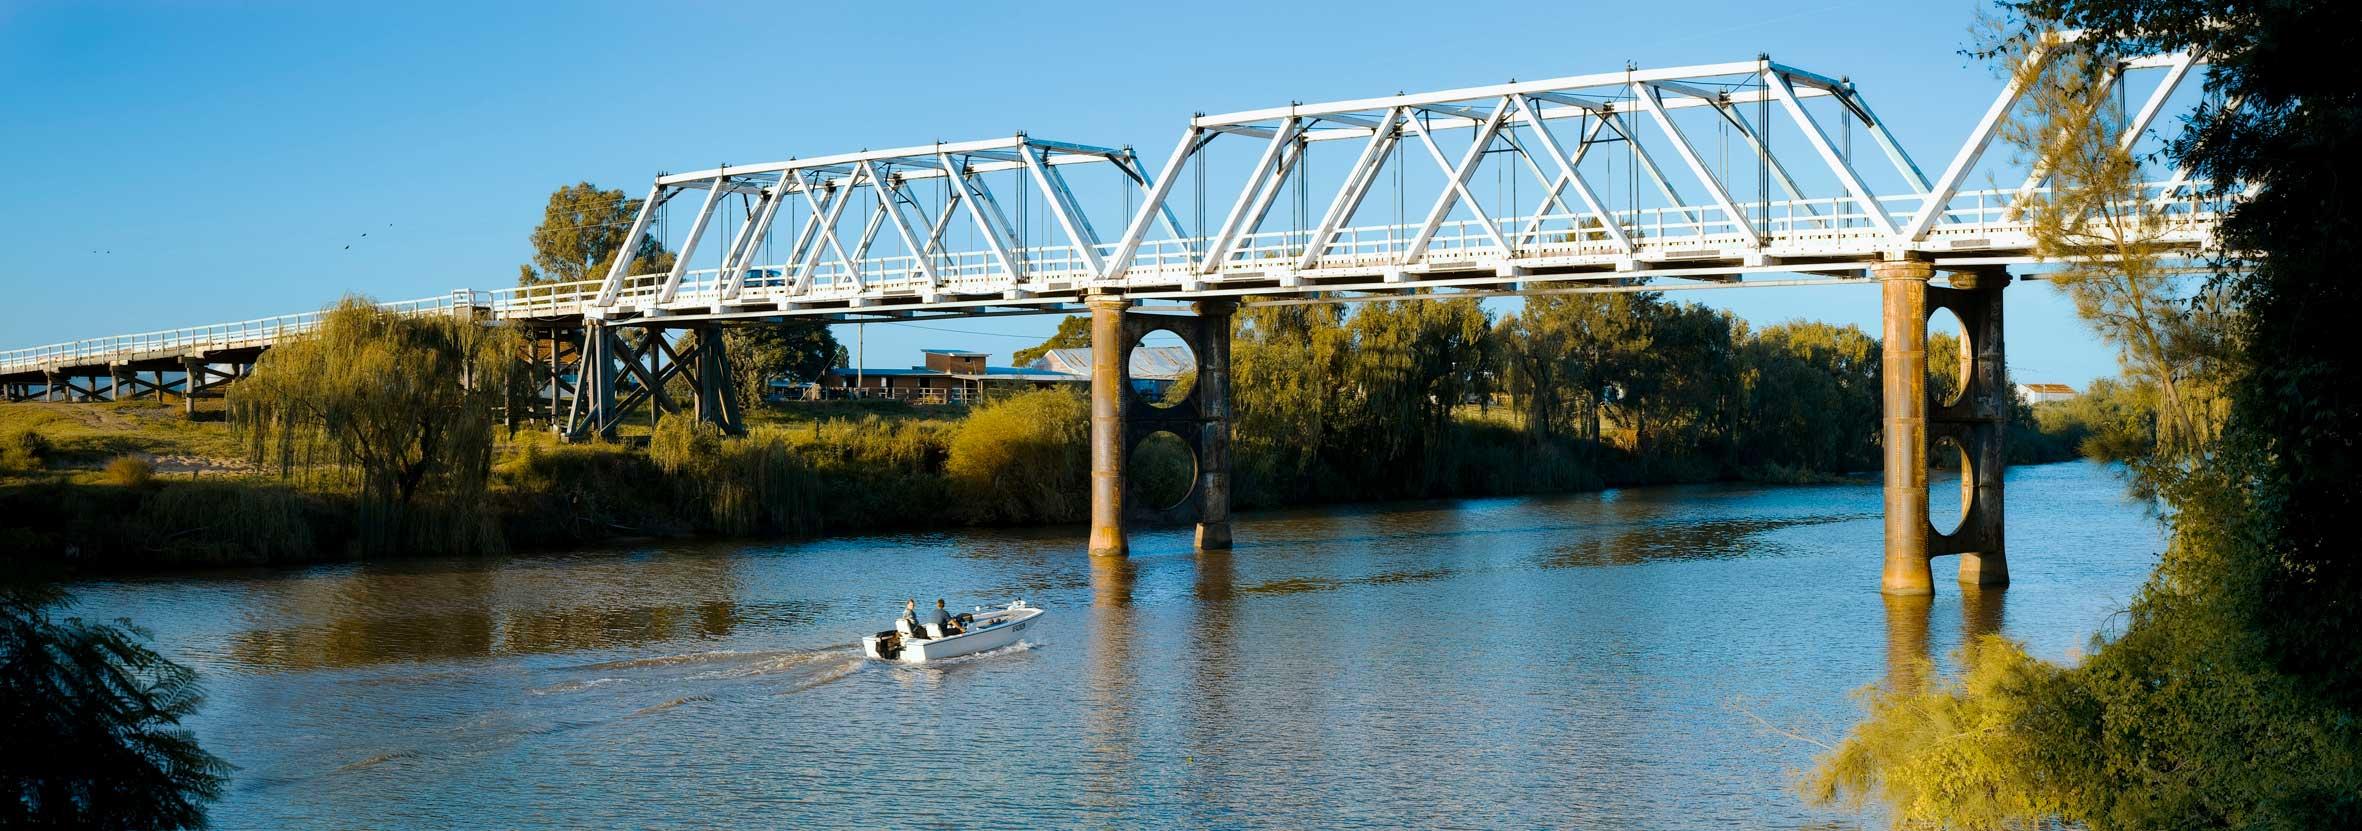 Morpeth-Bridge-landscape.jpg